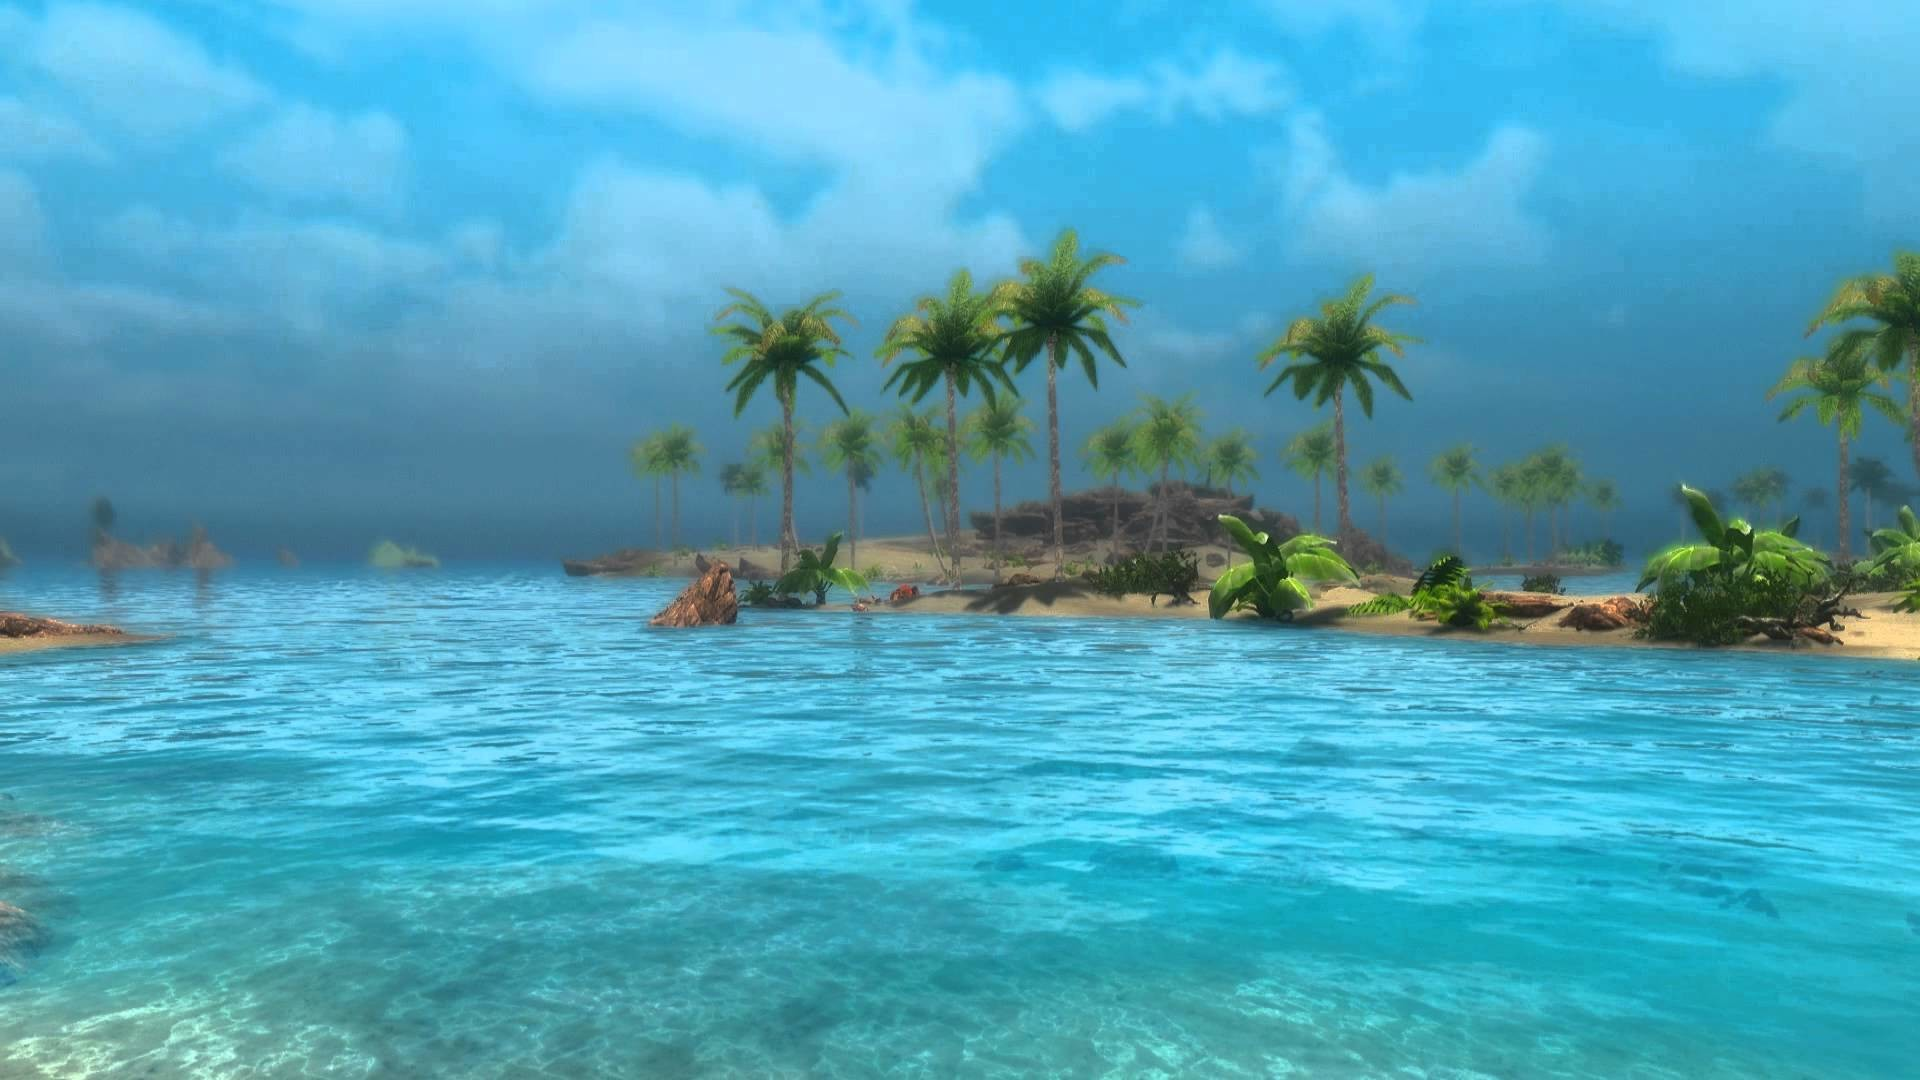 Animated Desktop Wallpaper – Tropical Skyrim 2 – Sunny Beach – YouTube